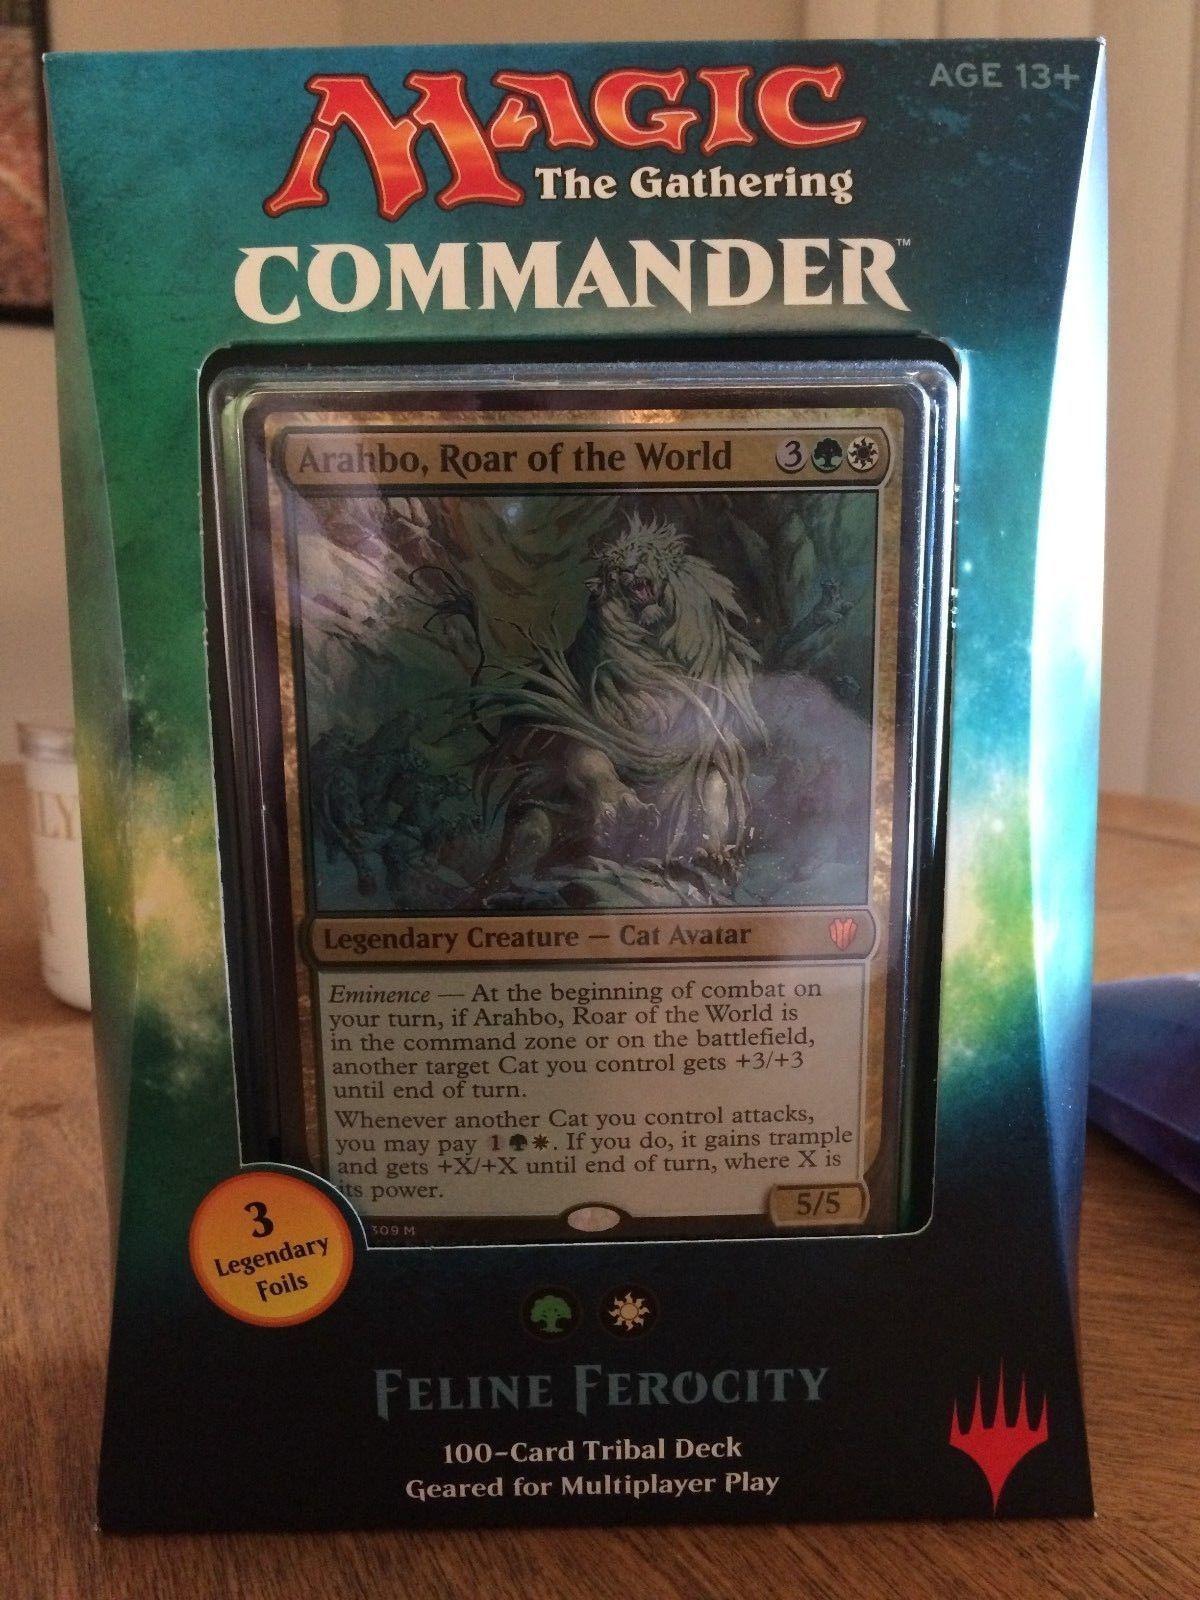 MTG Sealed Decks and Kits 183445: Mtg - Commander 2017 - Feline